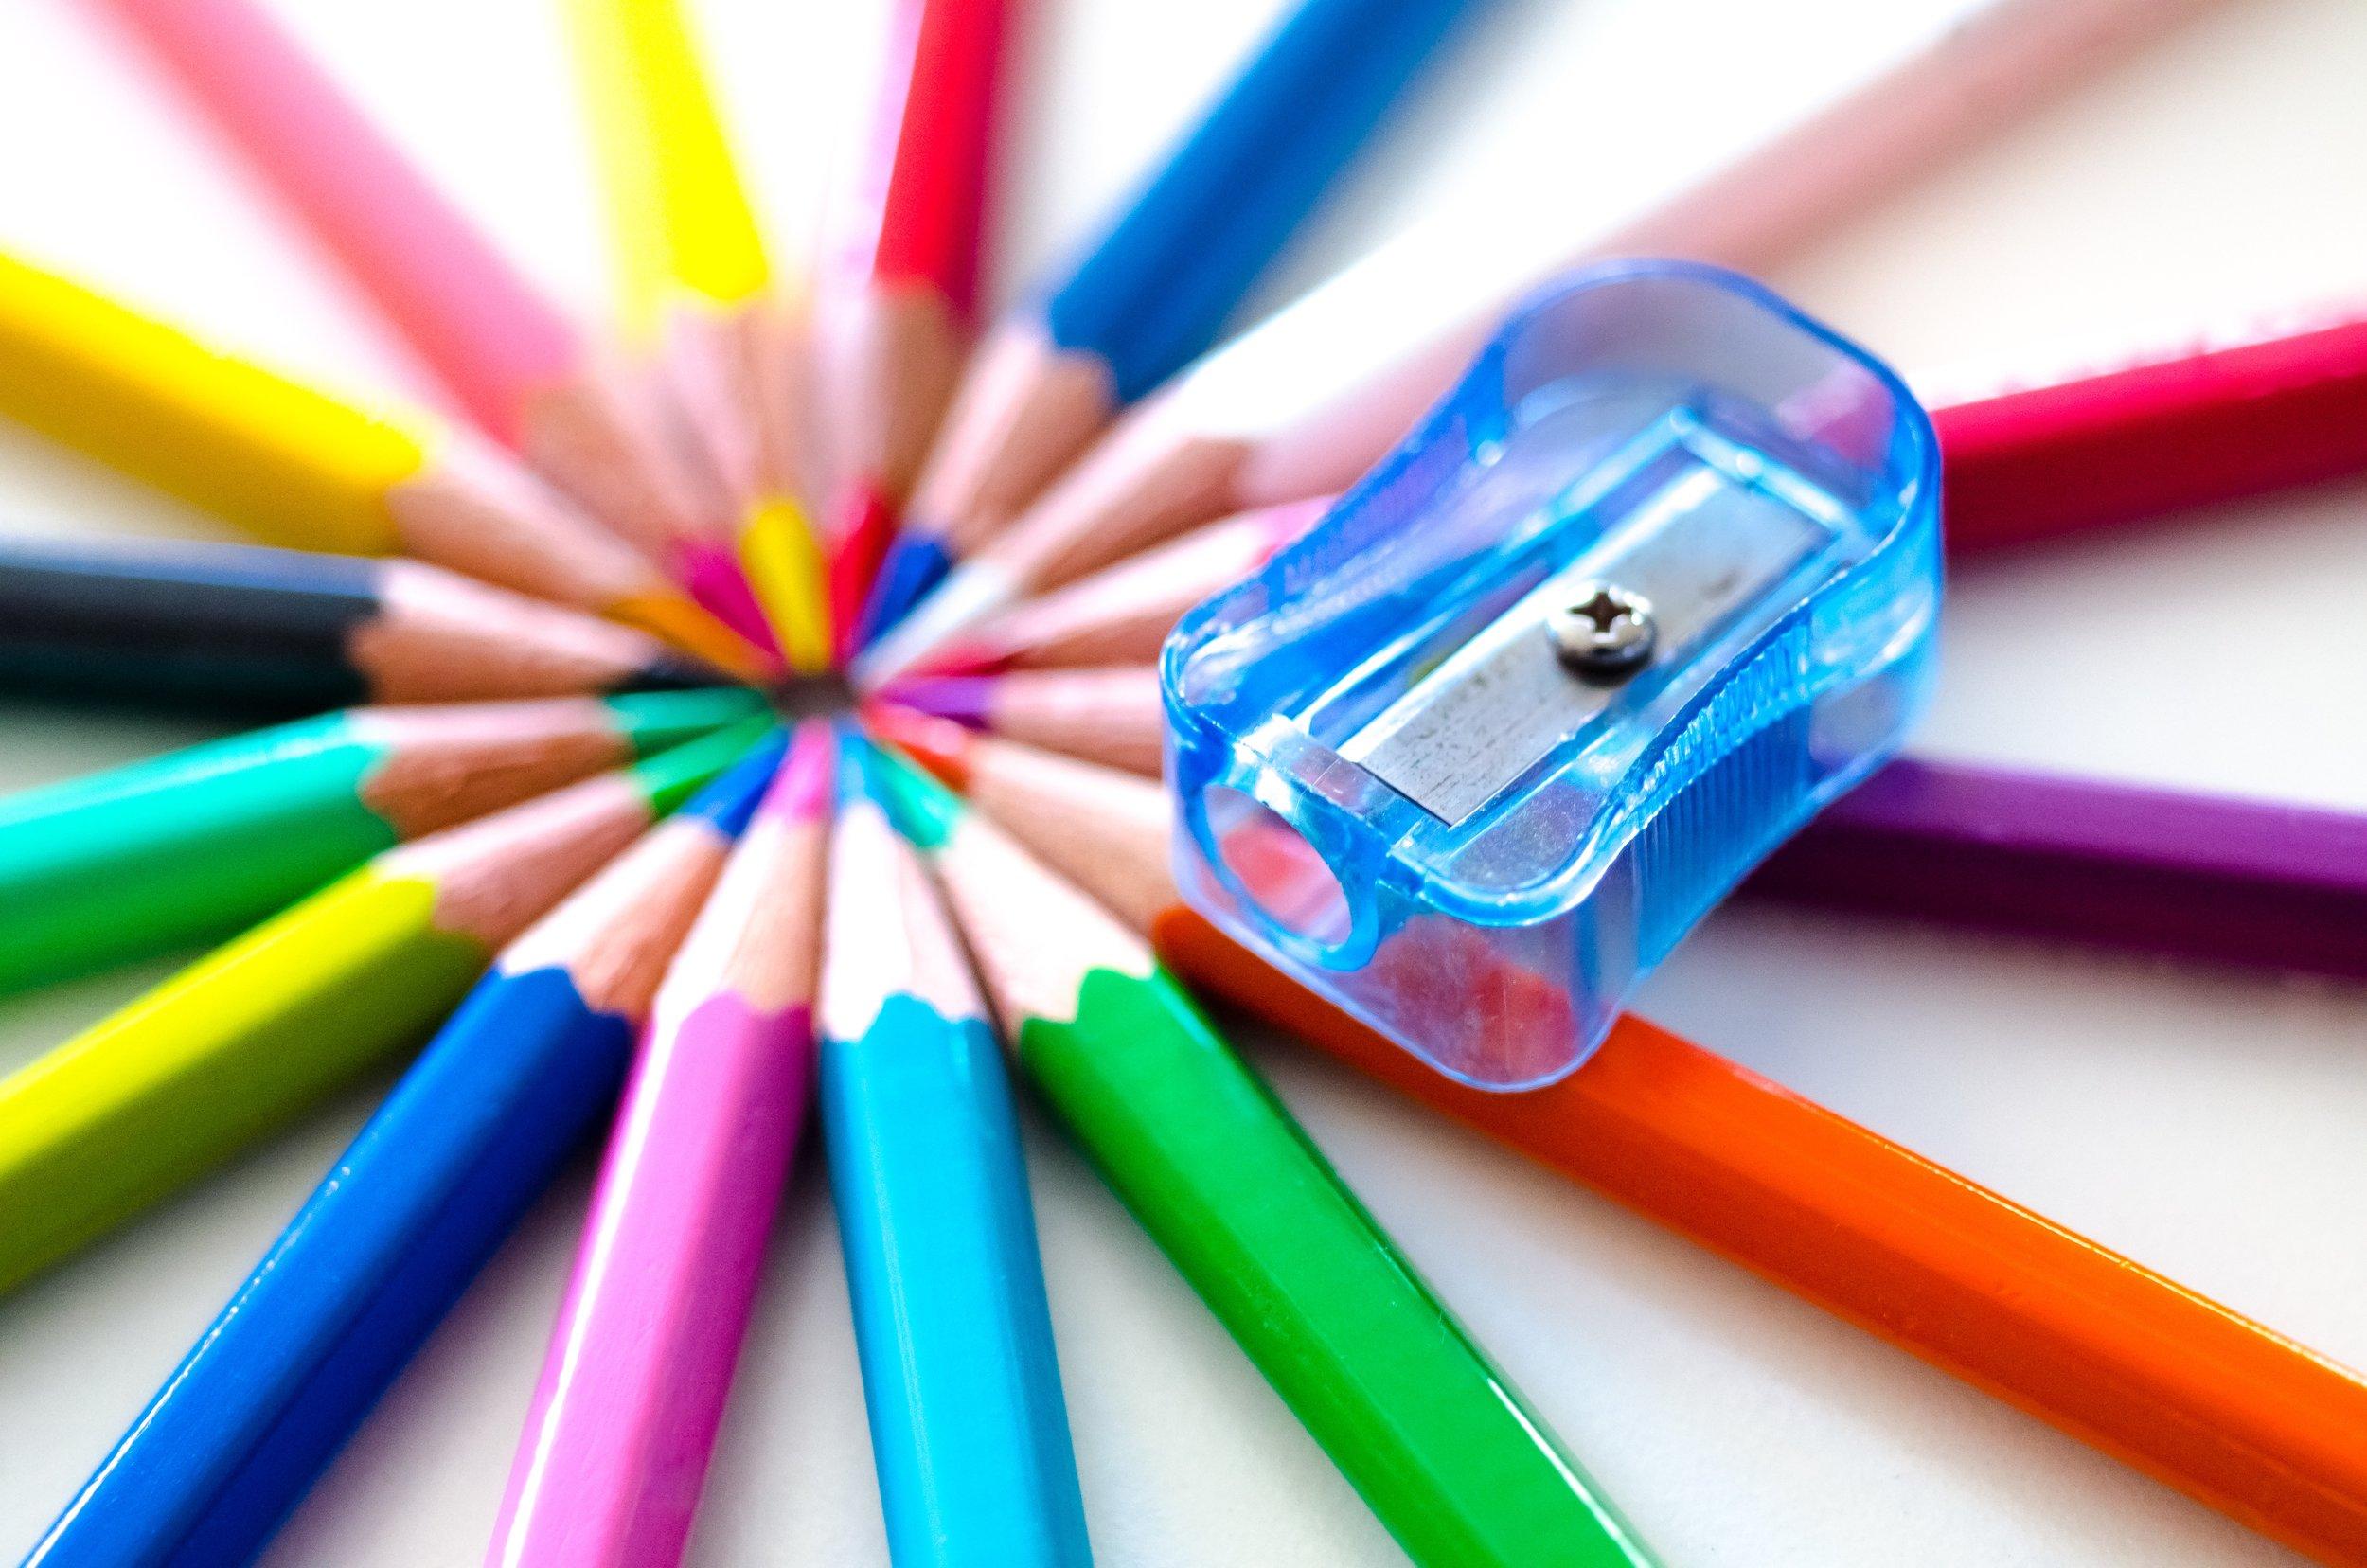 pencils-1365337.jpg